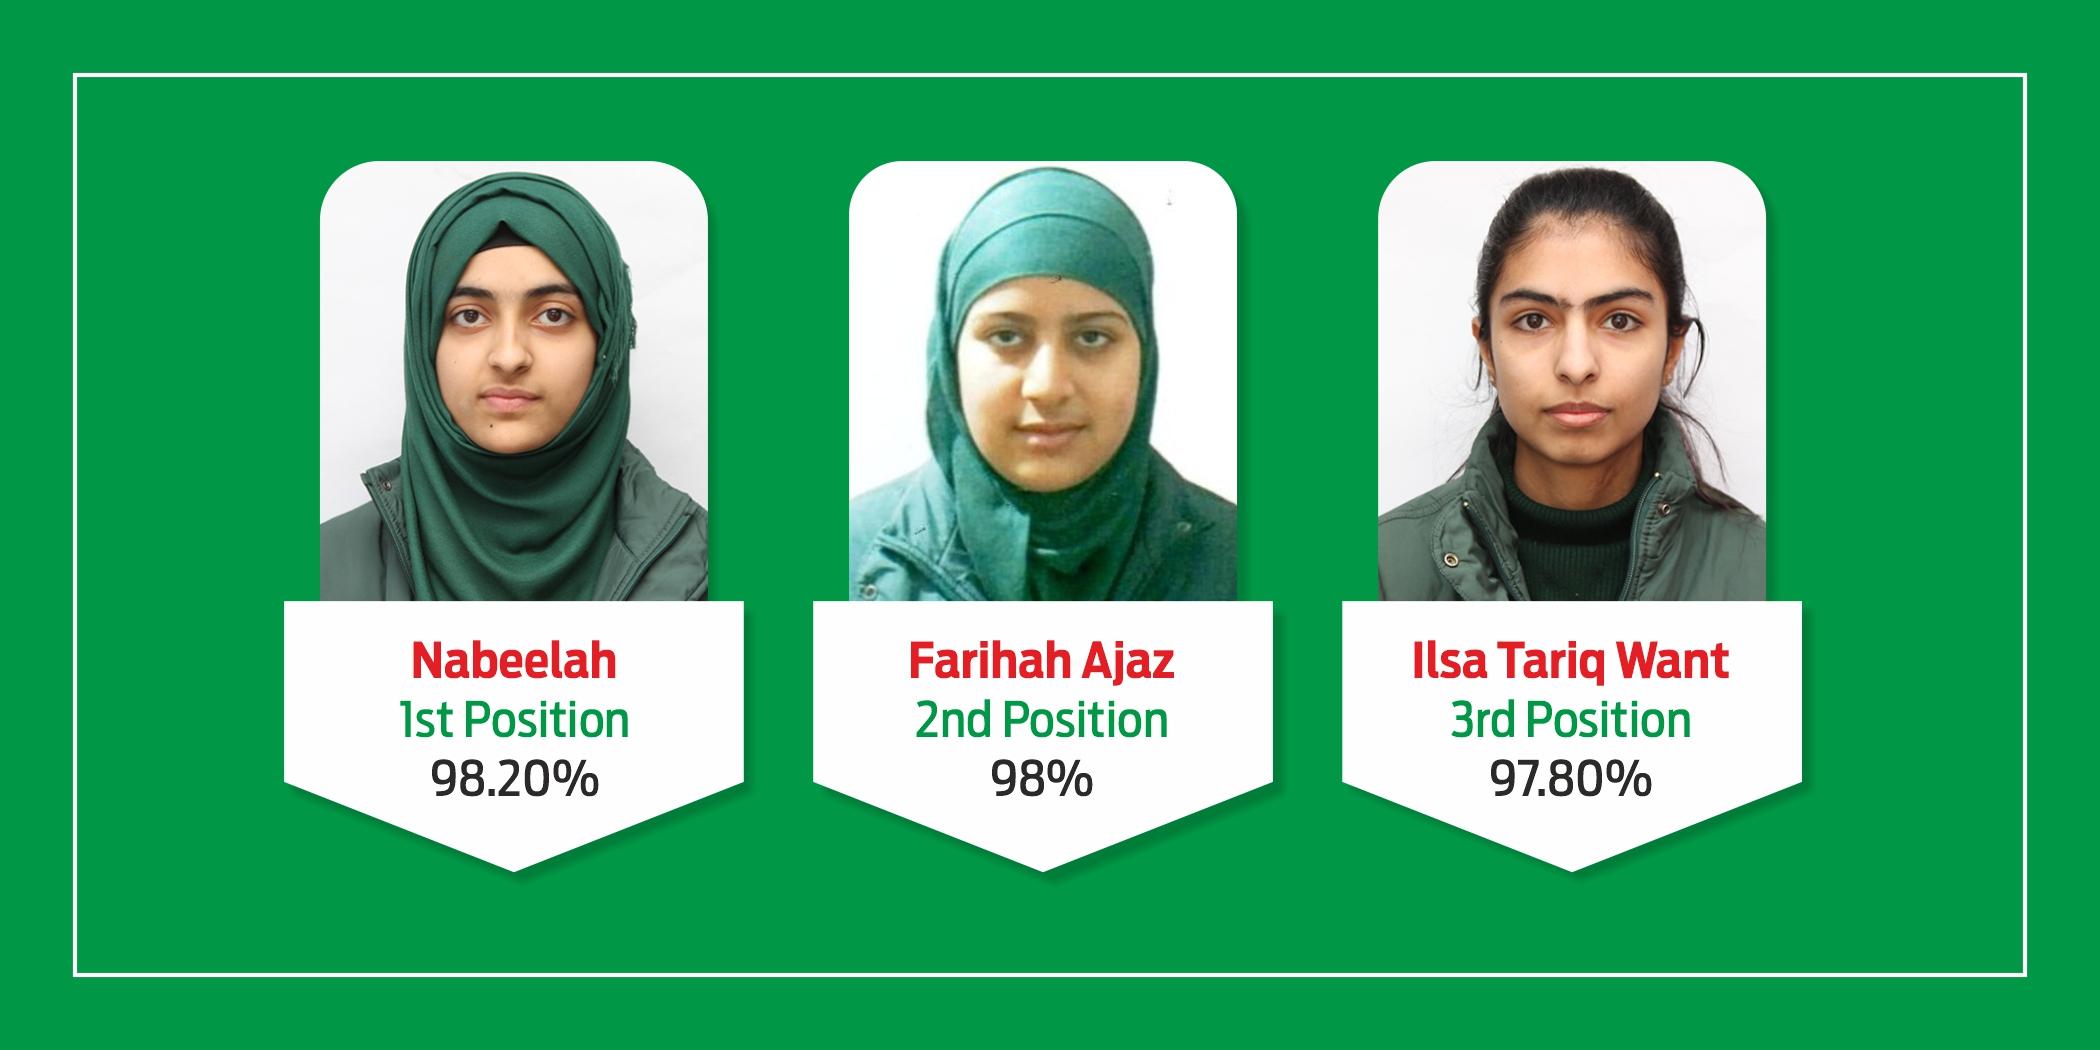 Delhi Public School Srinagar records 100% pass percentage in Class X CBSE results